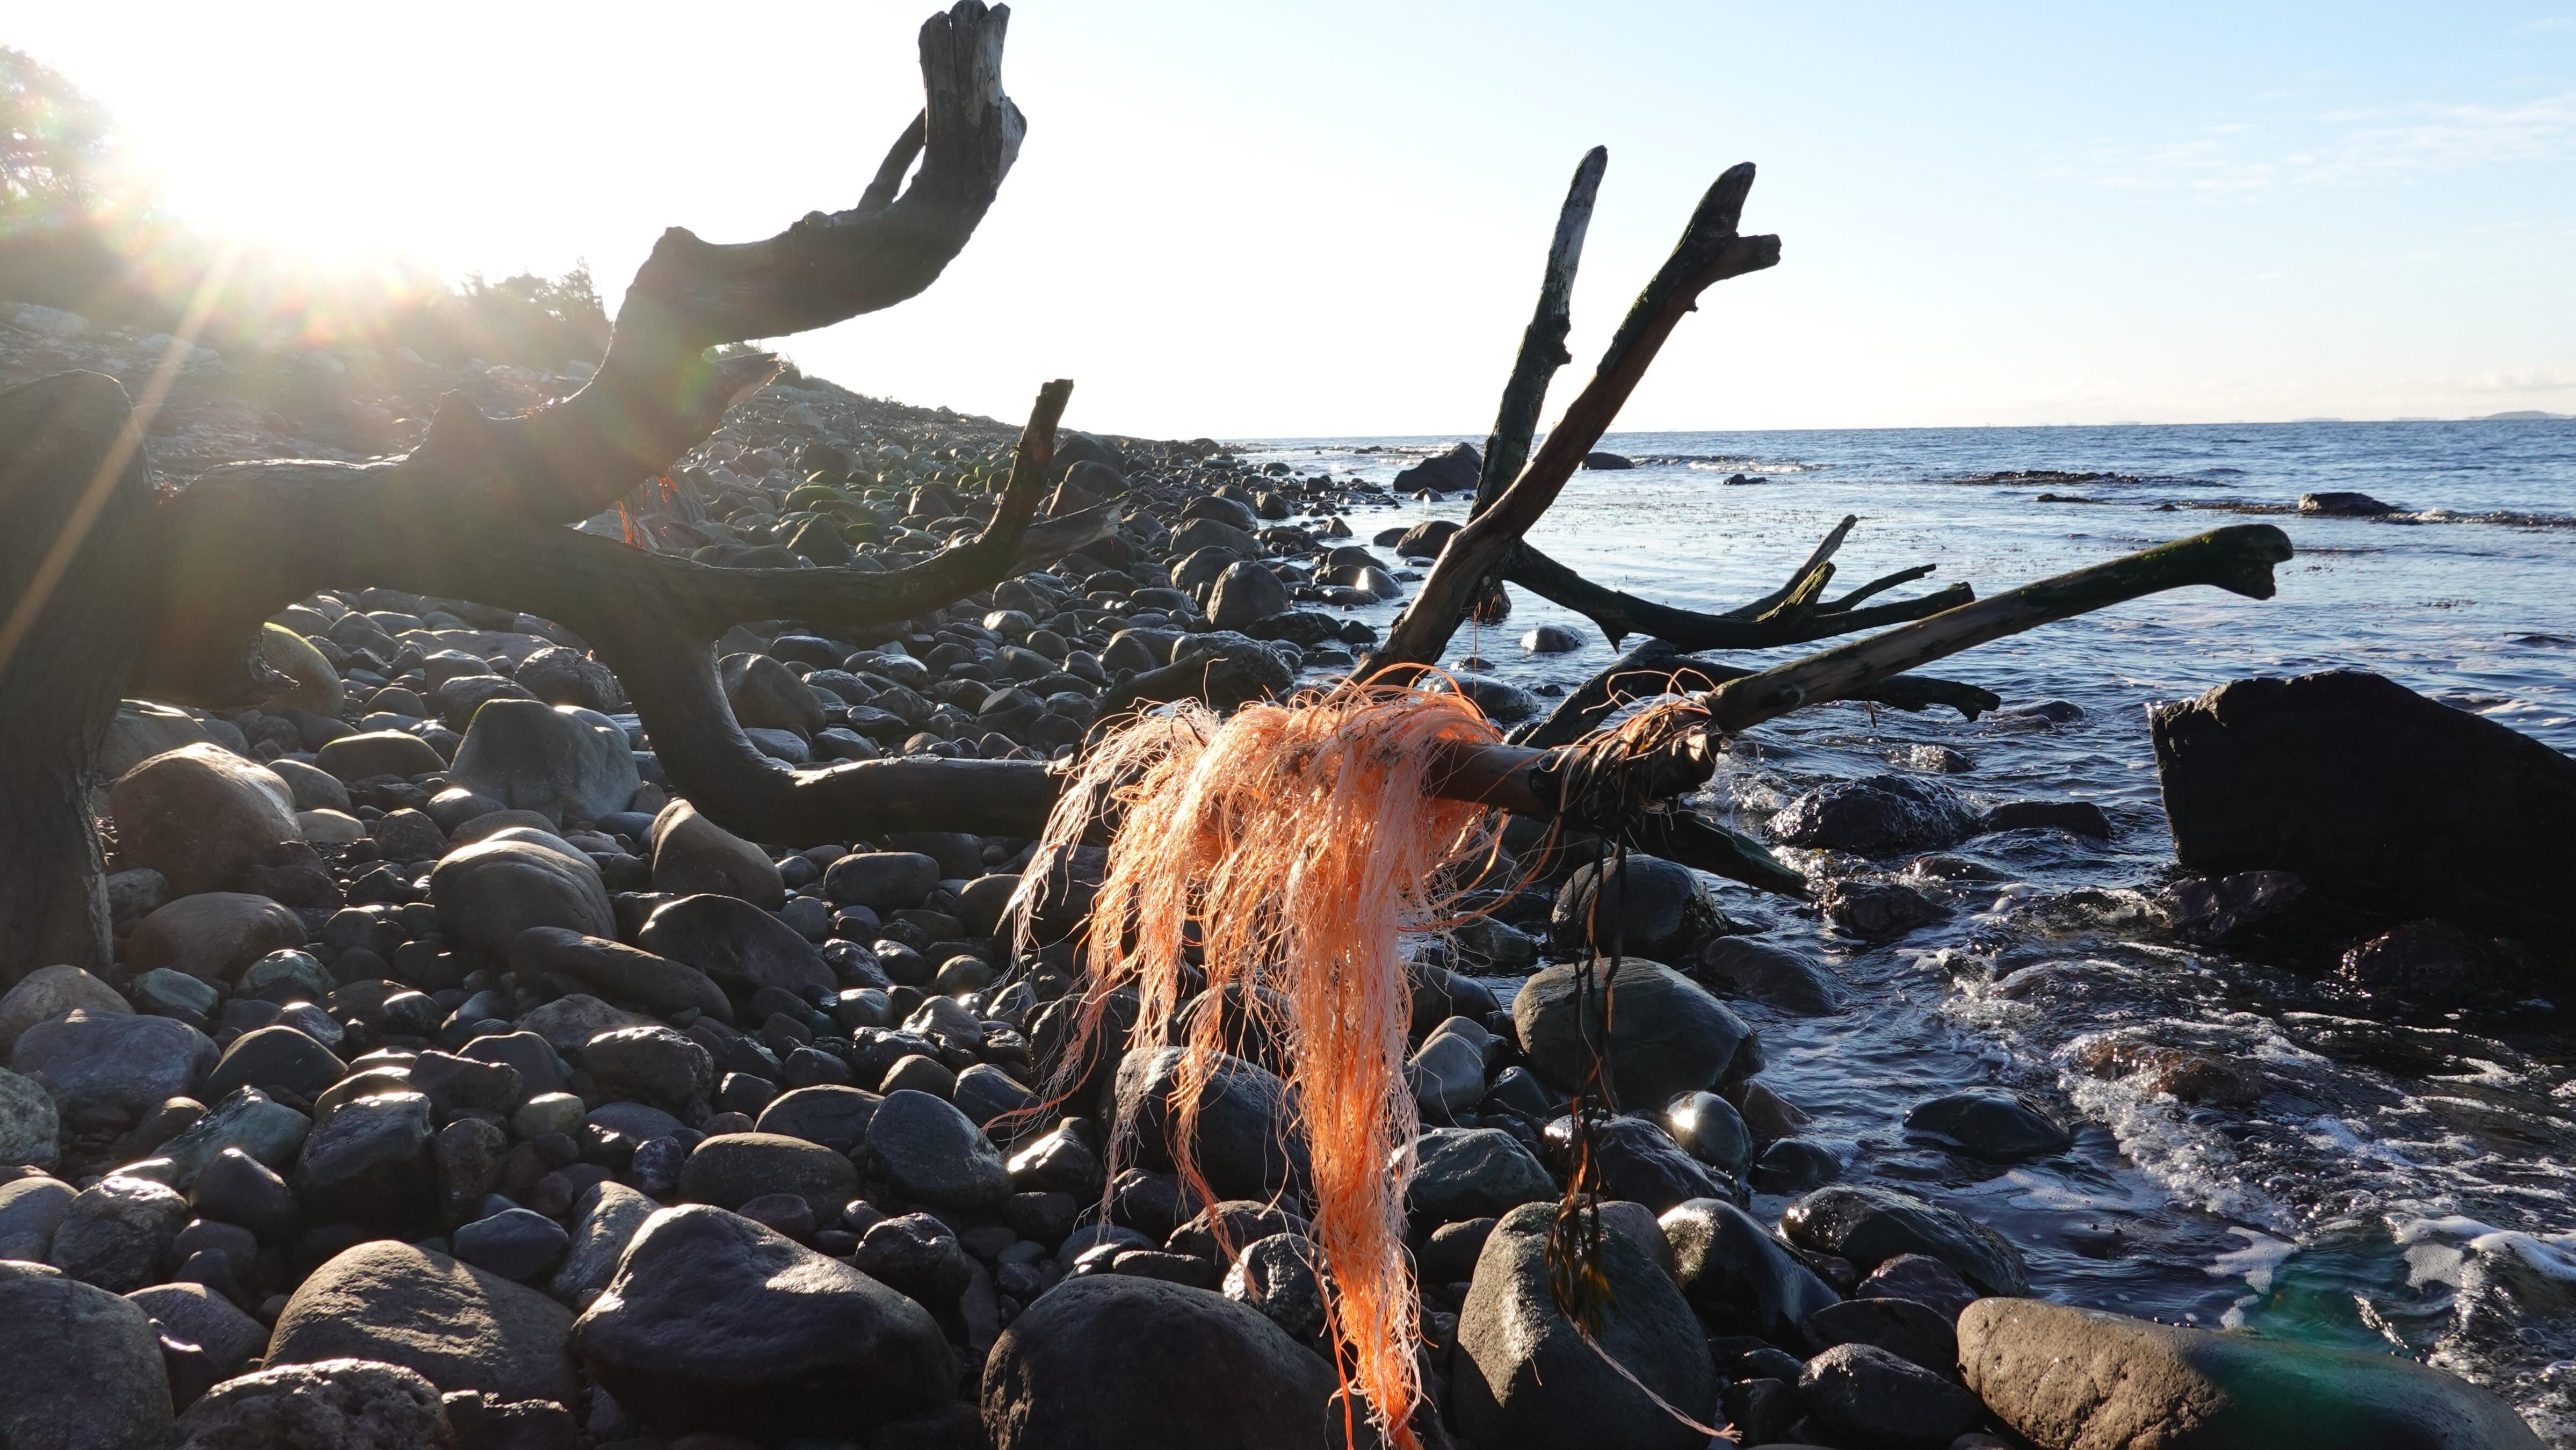 Oransje plasttråd hengende i en grein på en steinete strand